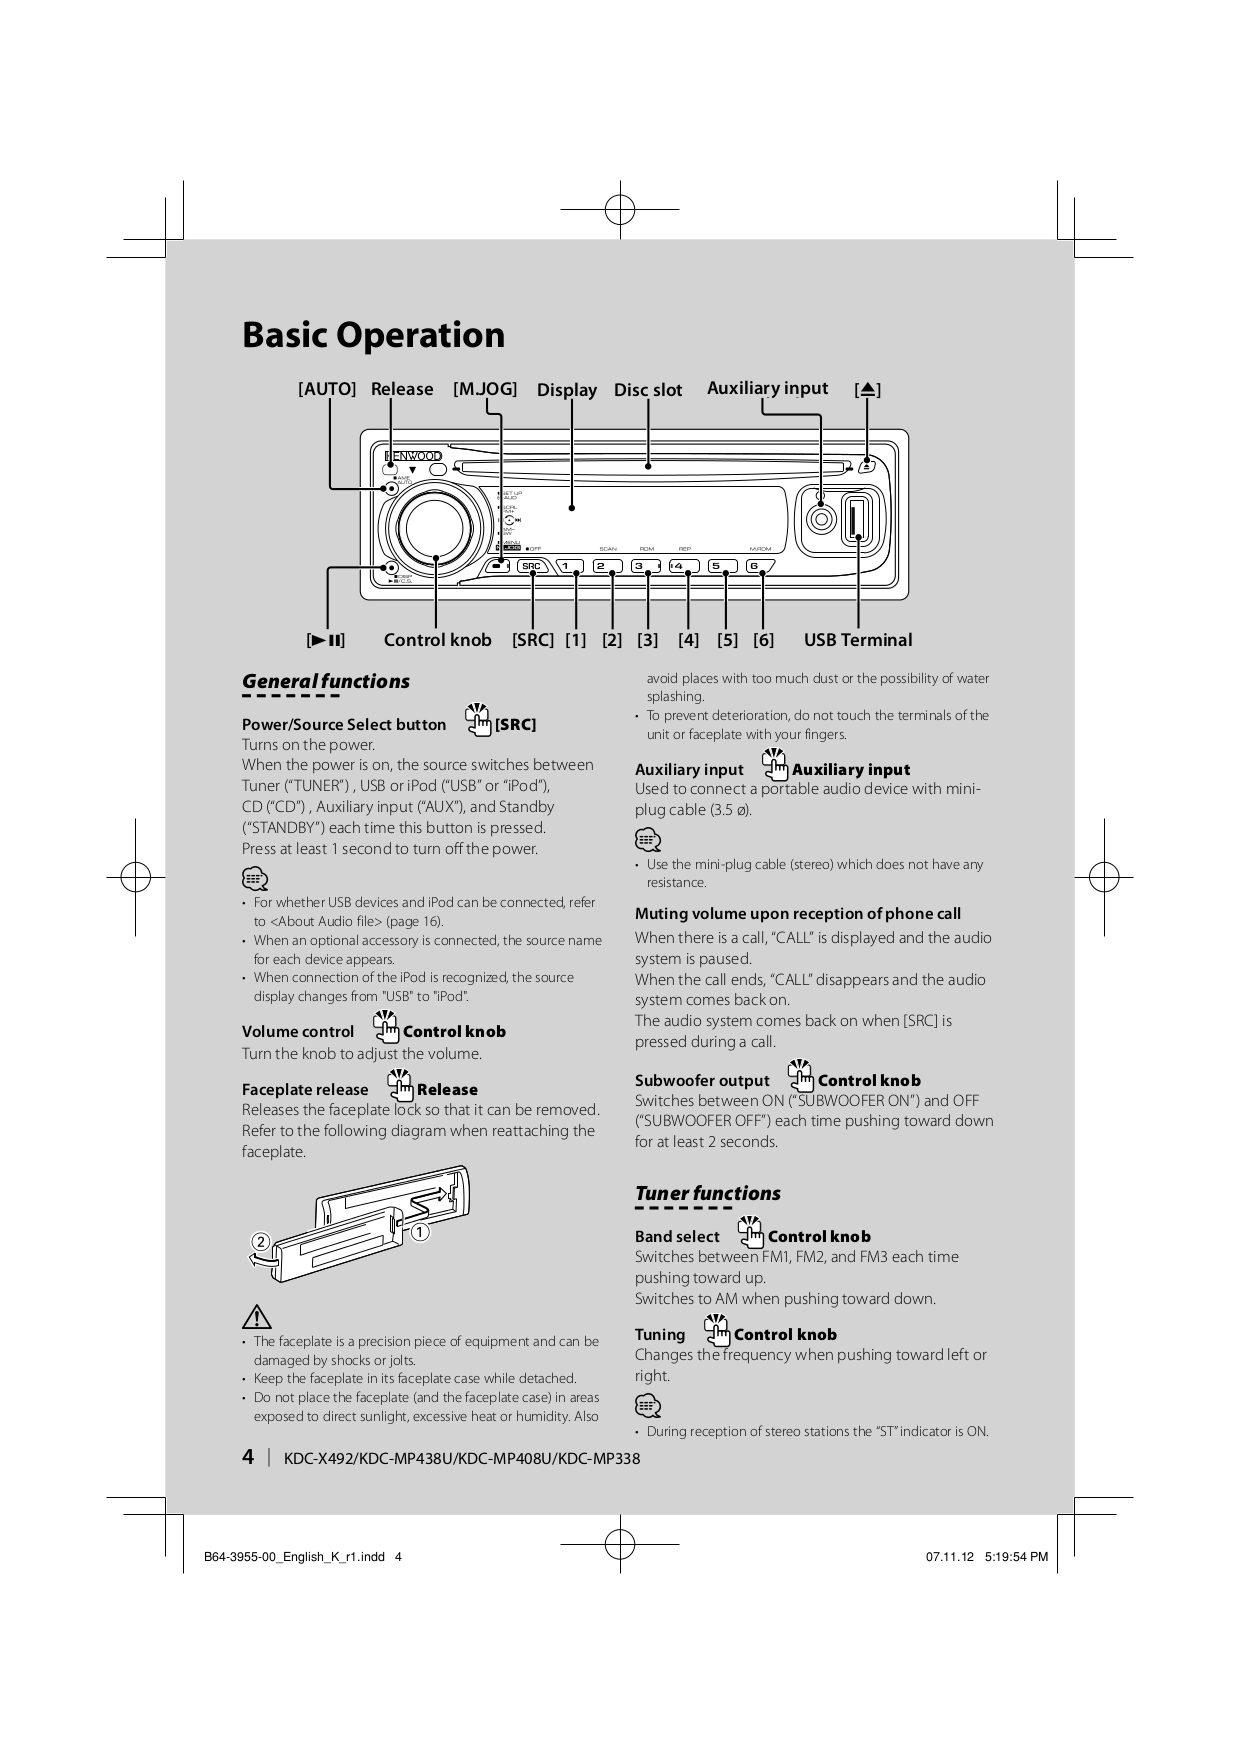 Wiring Diagram Kenwood Kdc Mp438u Explained Diagrams X492 Mp338 Manual Guide Example 2018 U2022